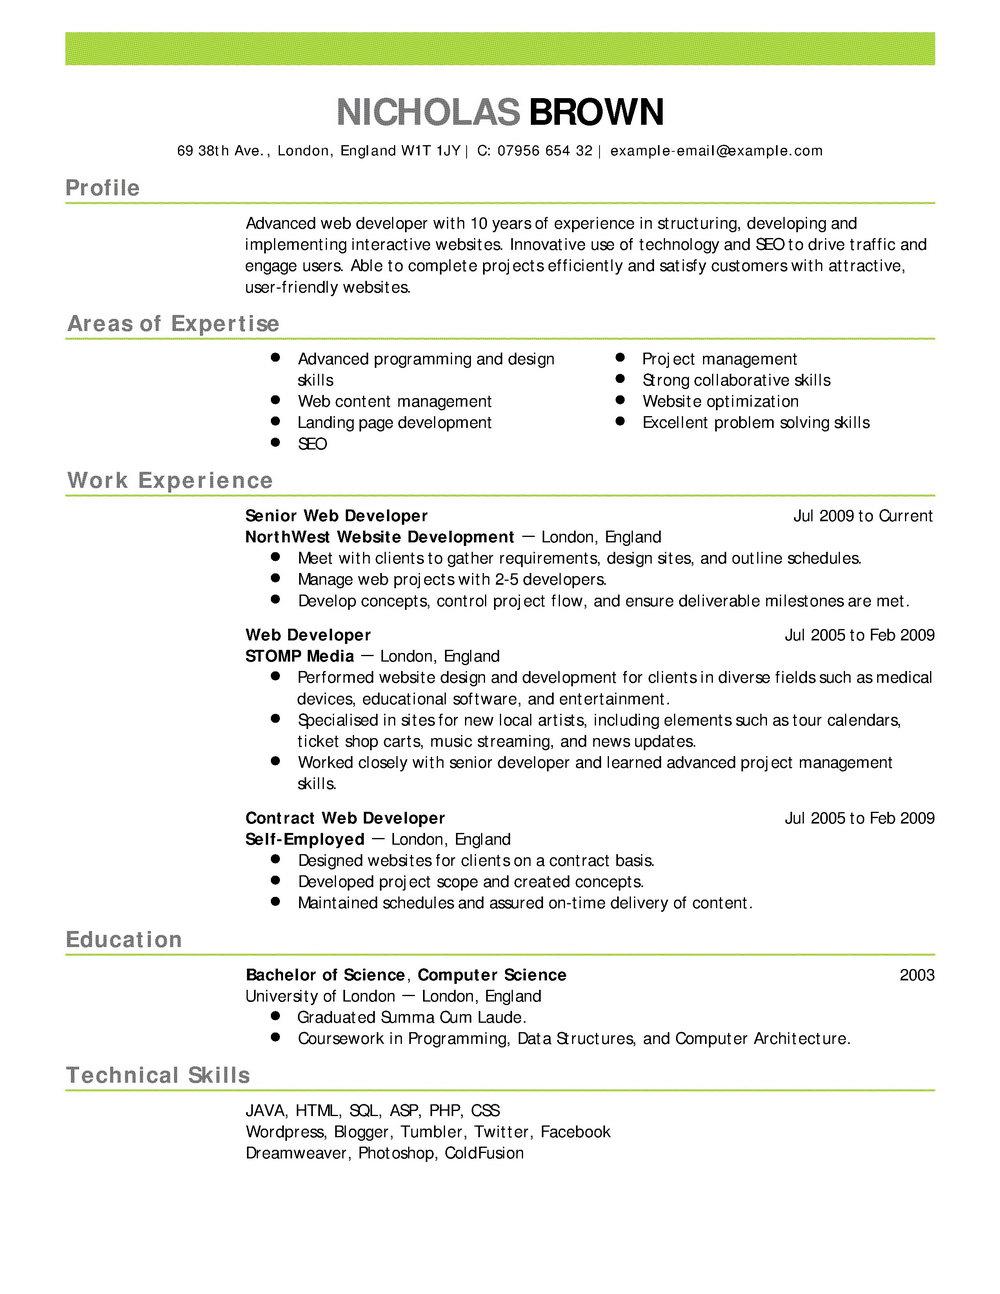 Completely Free Resume Builder] Resume Builder For Print Intajob